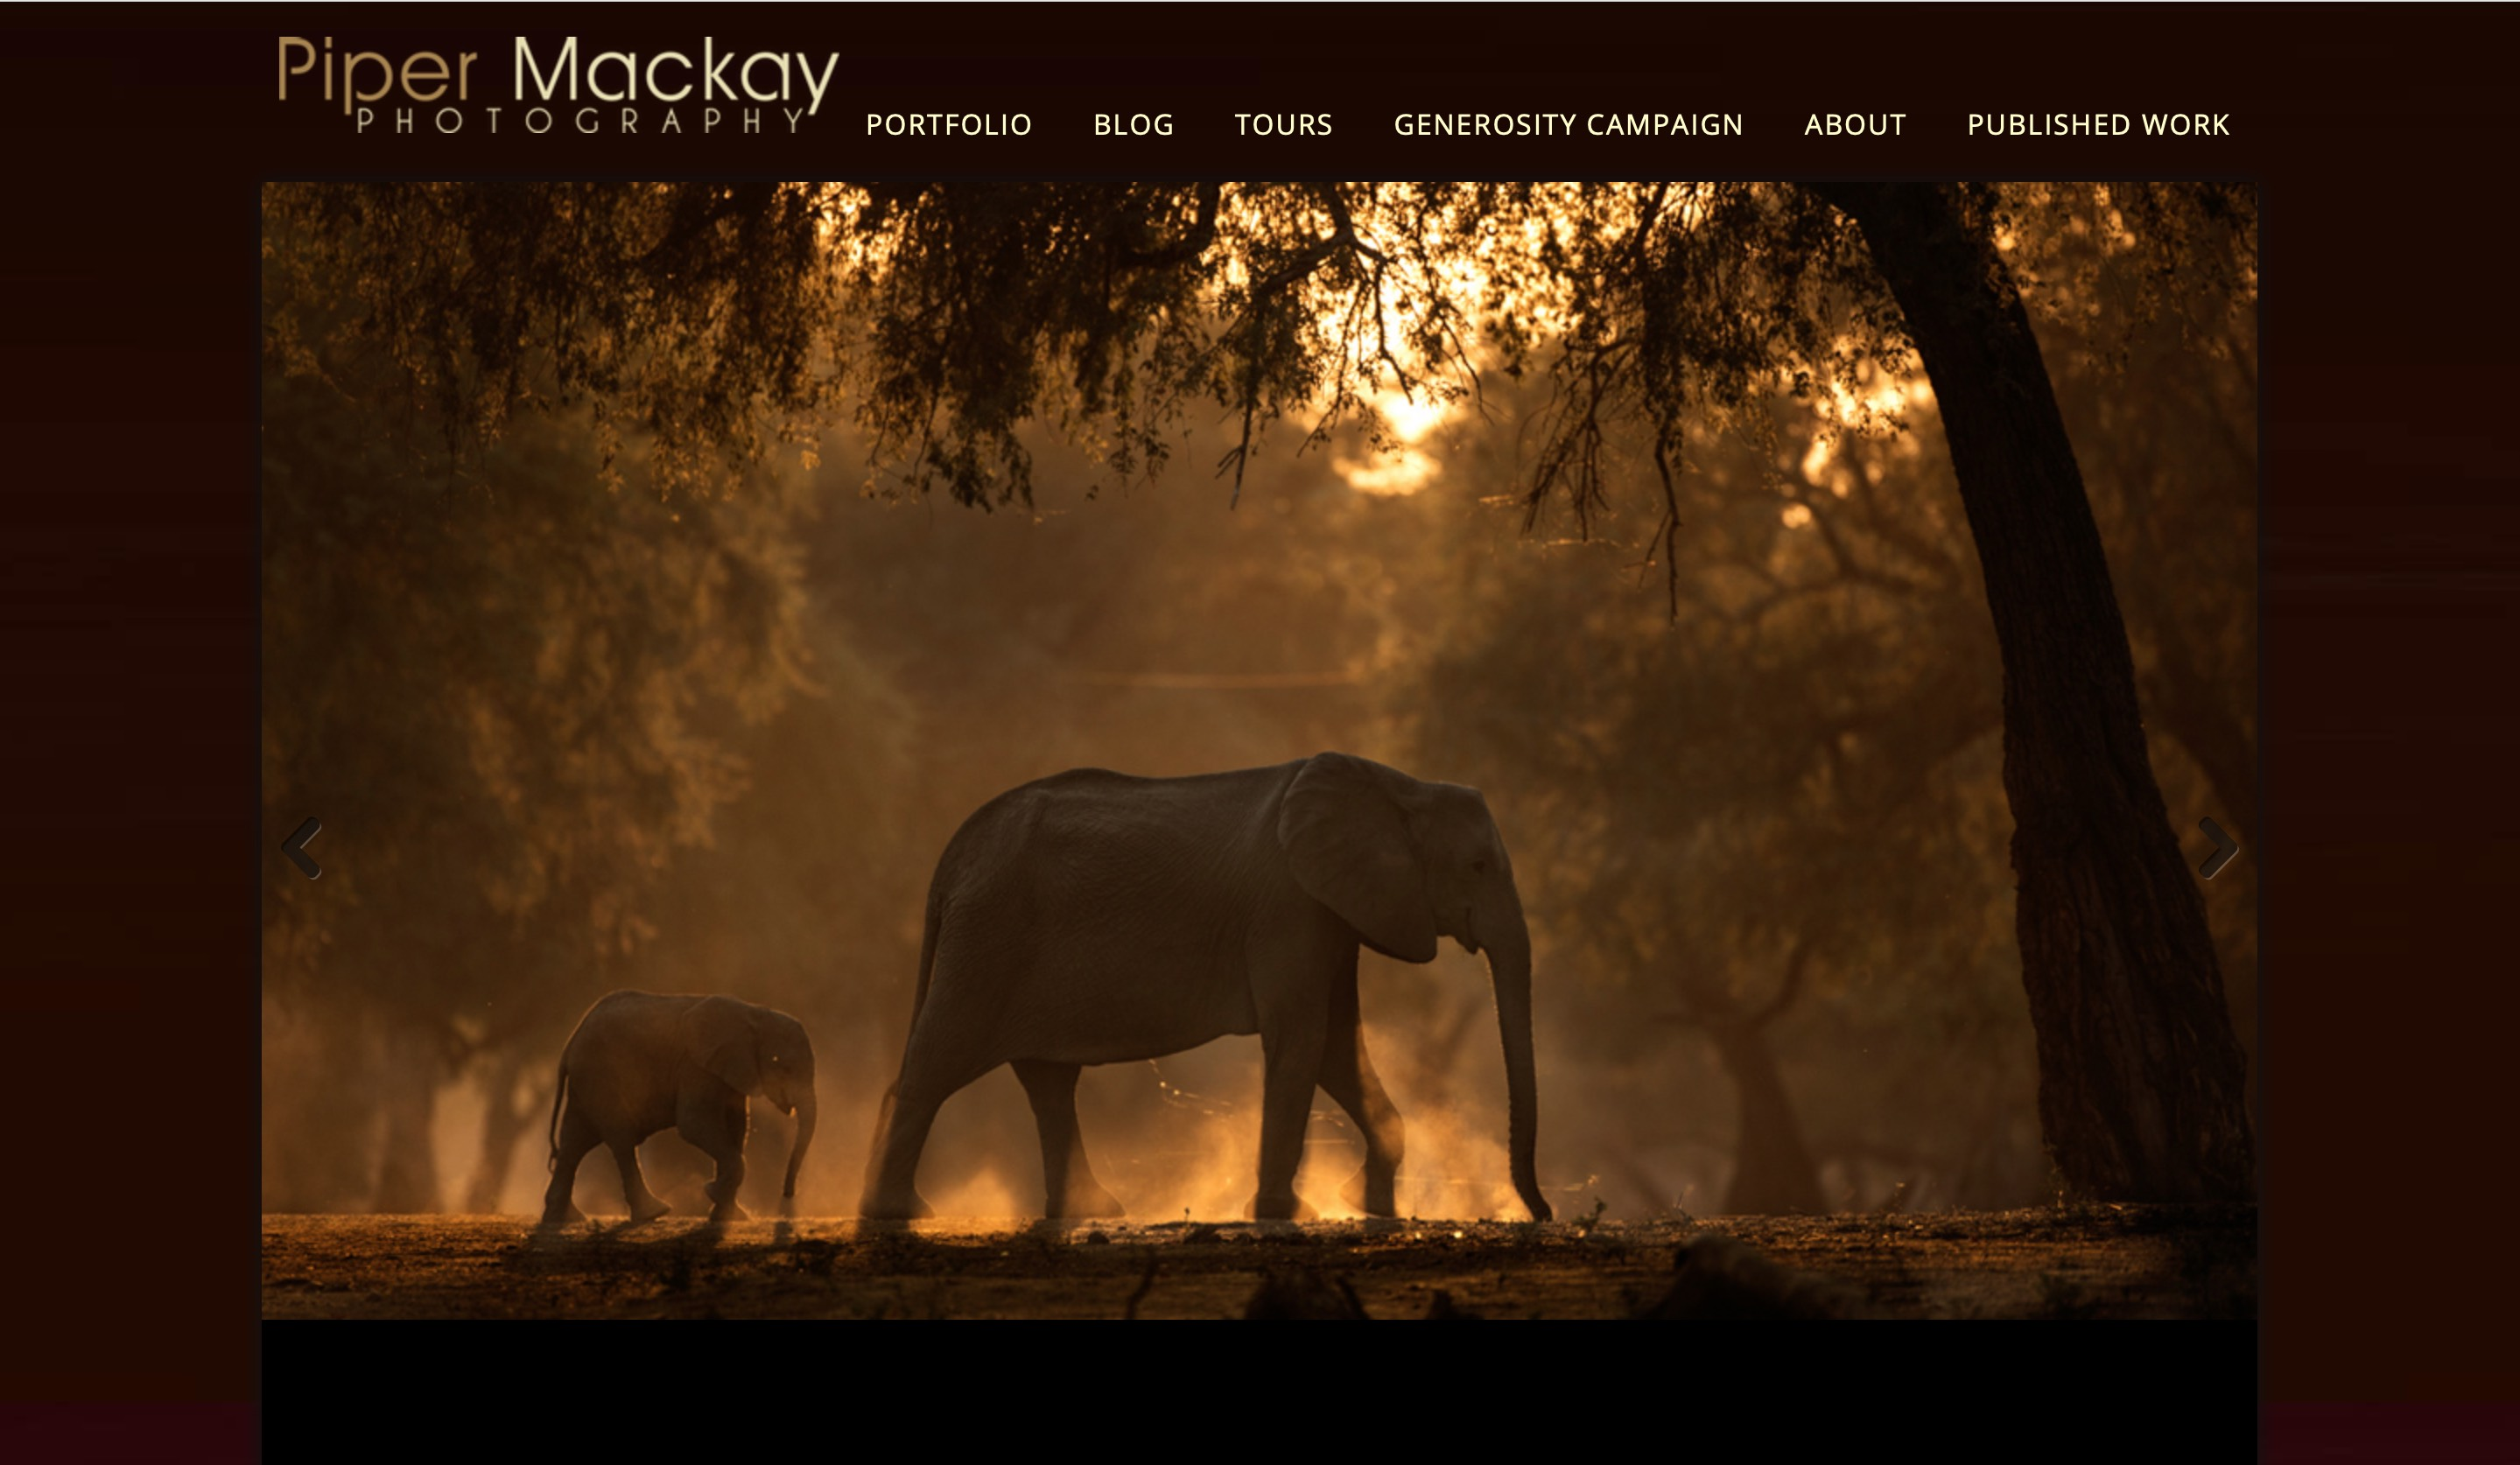 Piper Mackay website home page screenshot